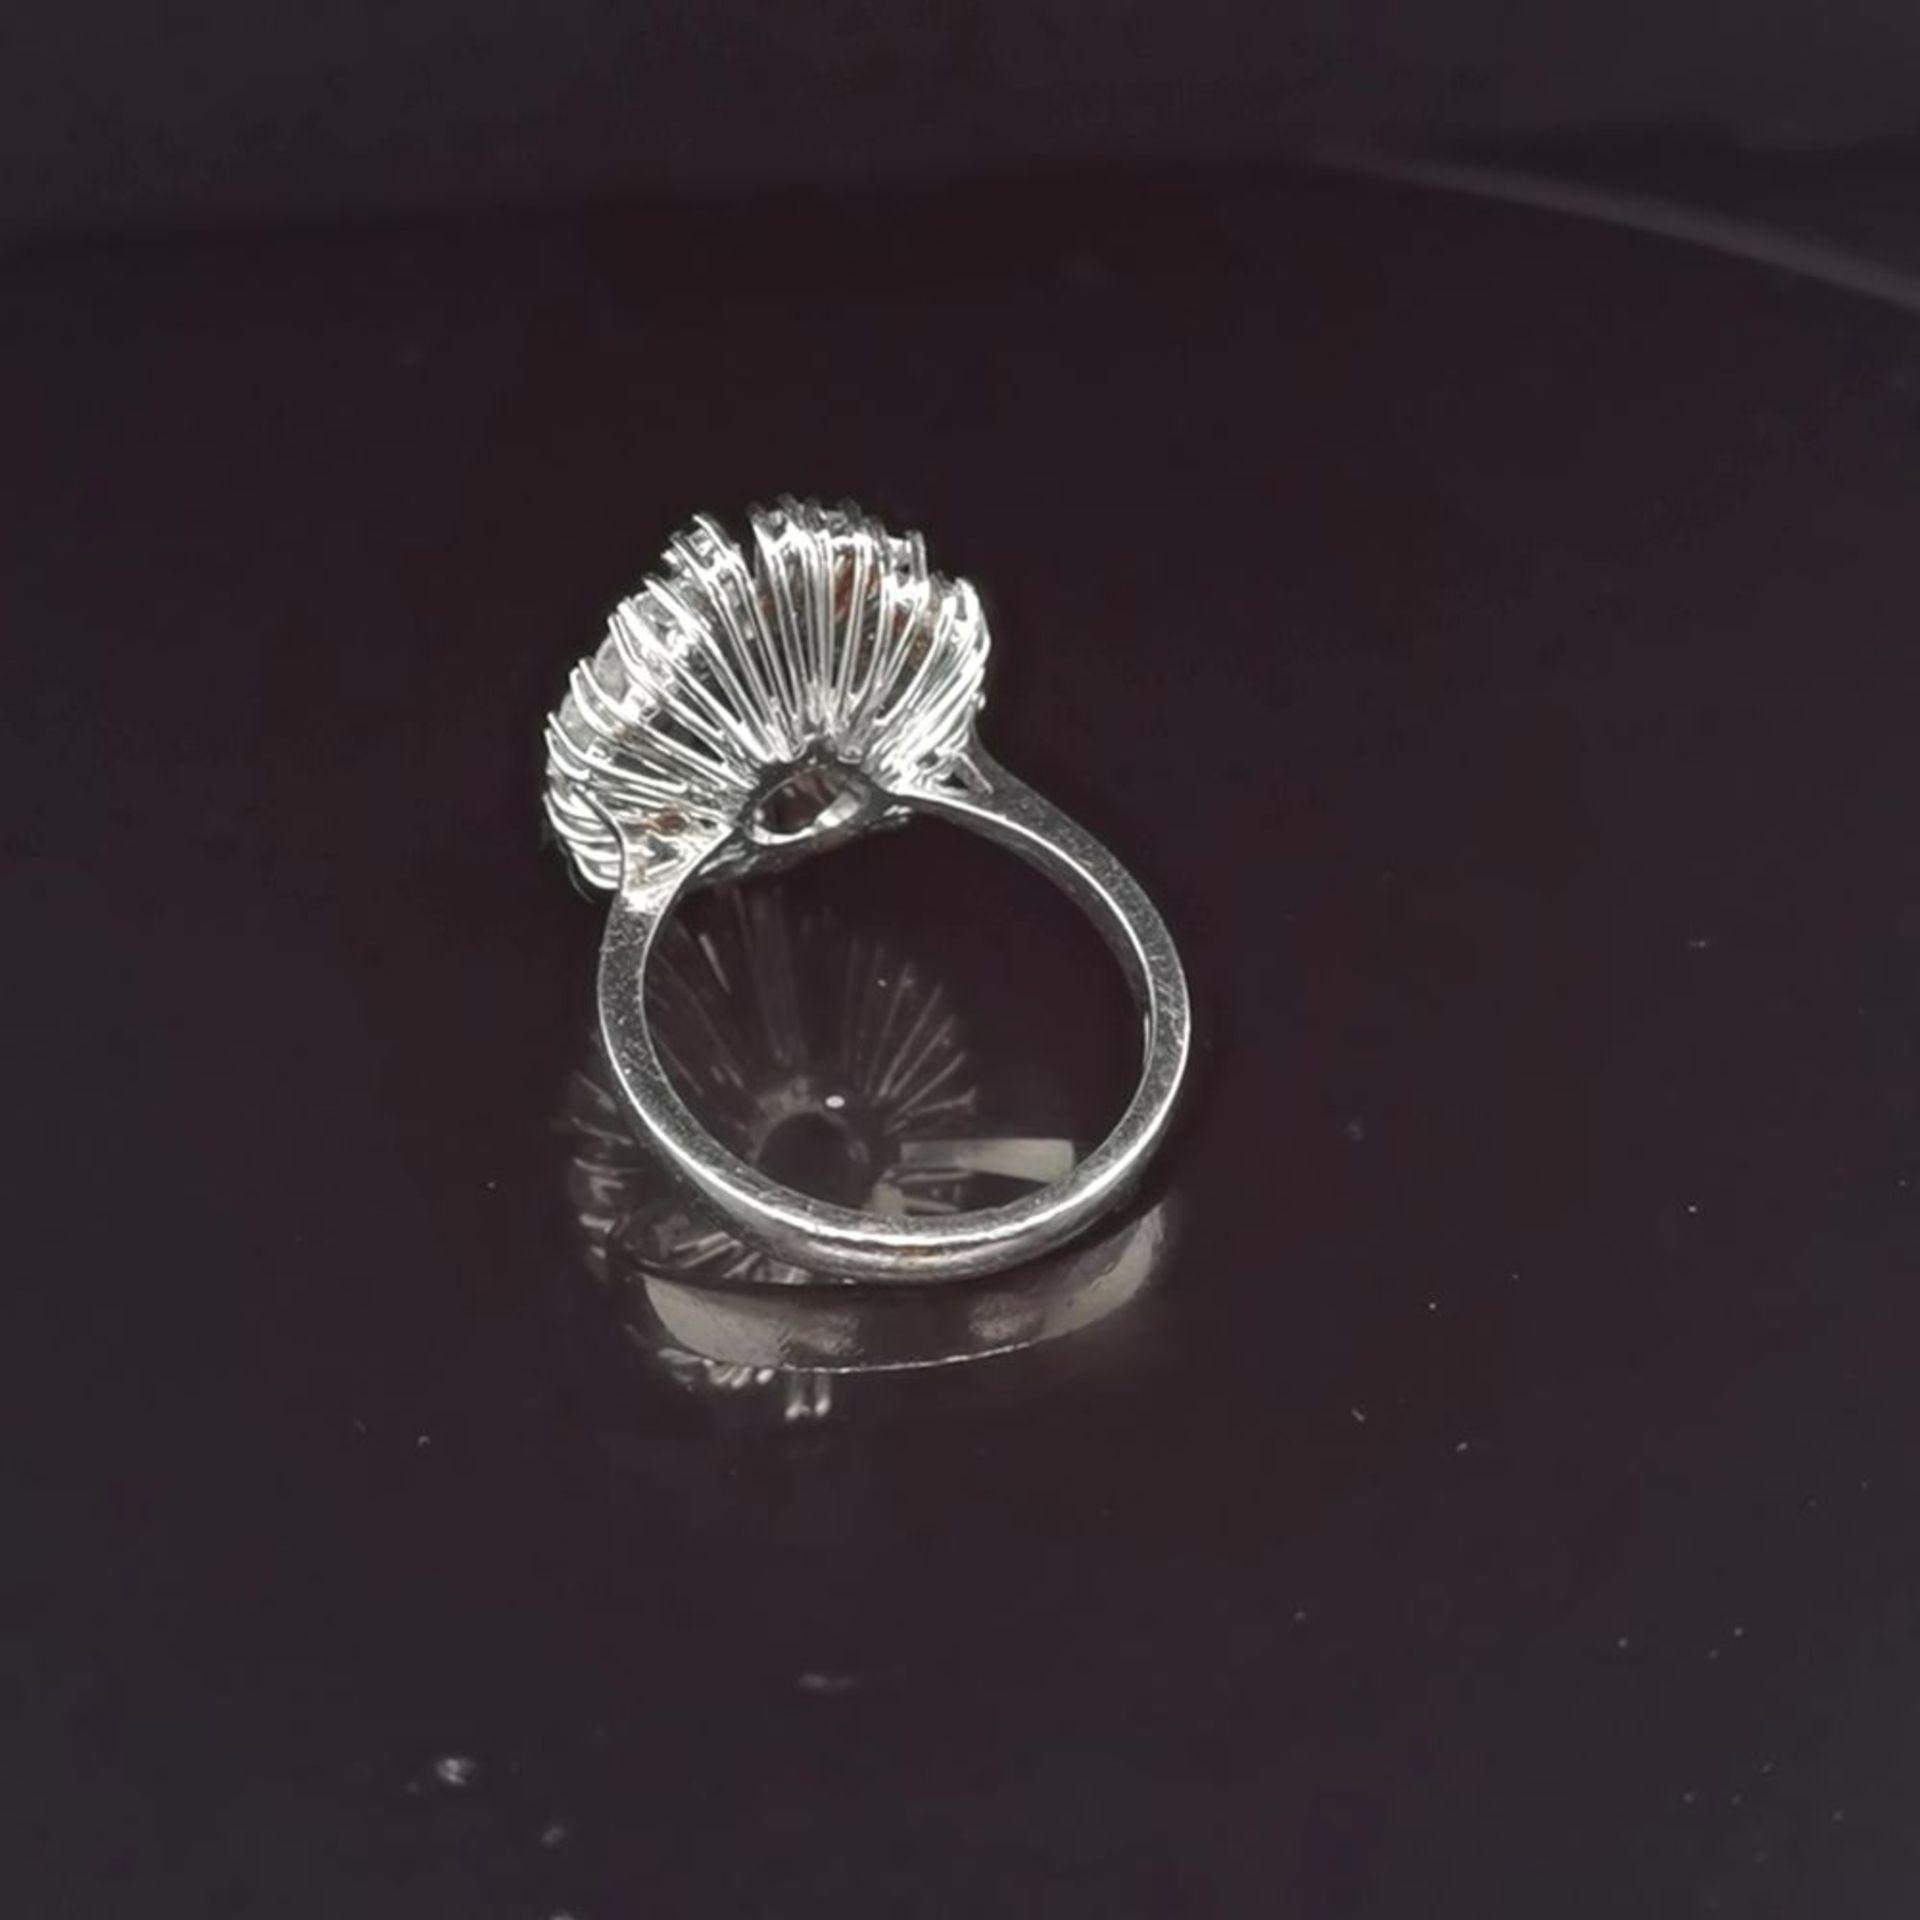 Saphir-Brillant-Ring, 585 Weißgold 6,7 - Image 3 of 3